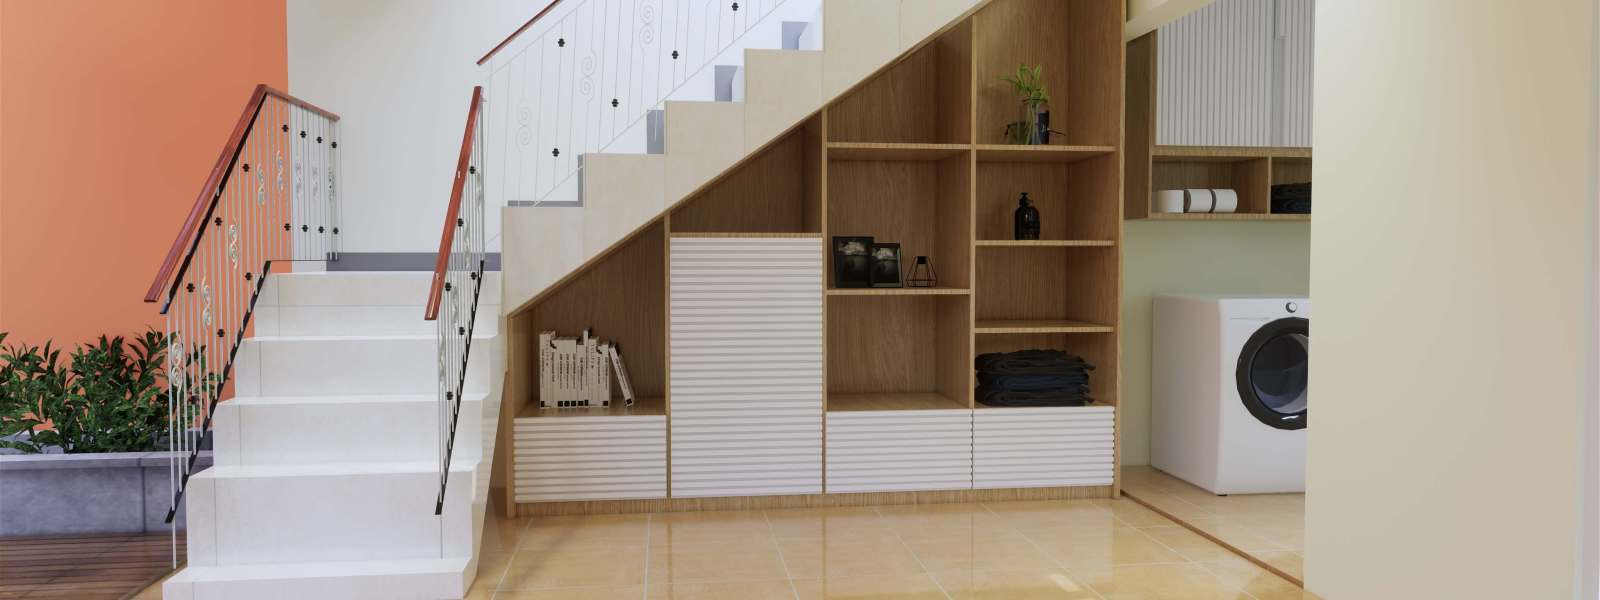 lemari kabinet bawah tangga